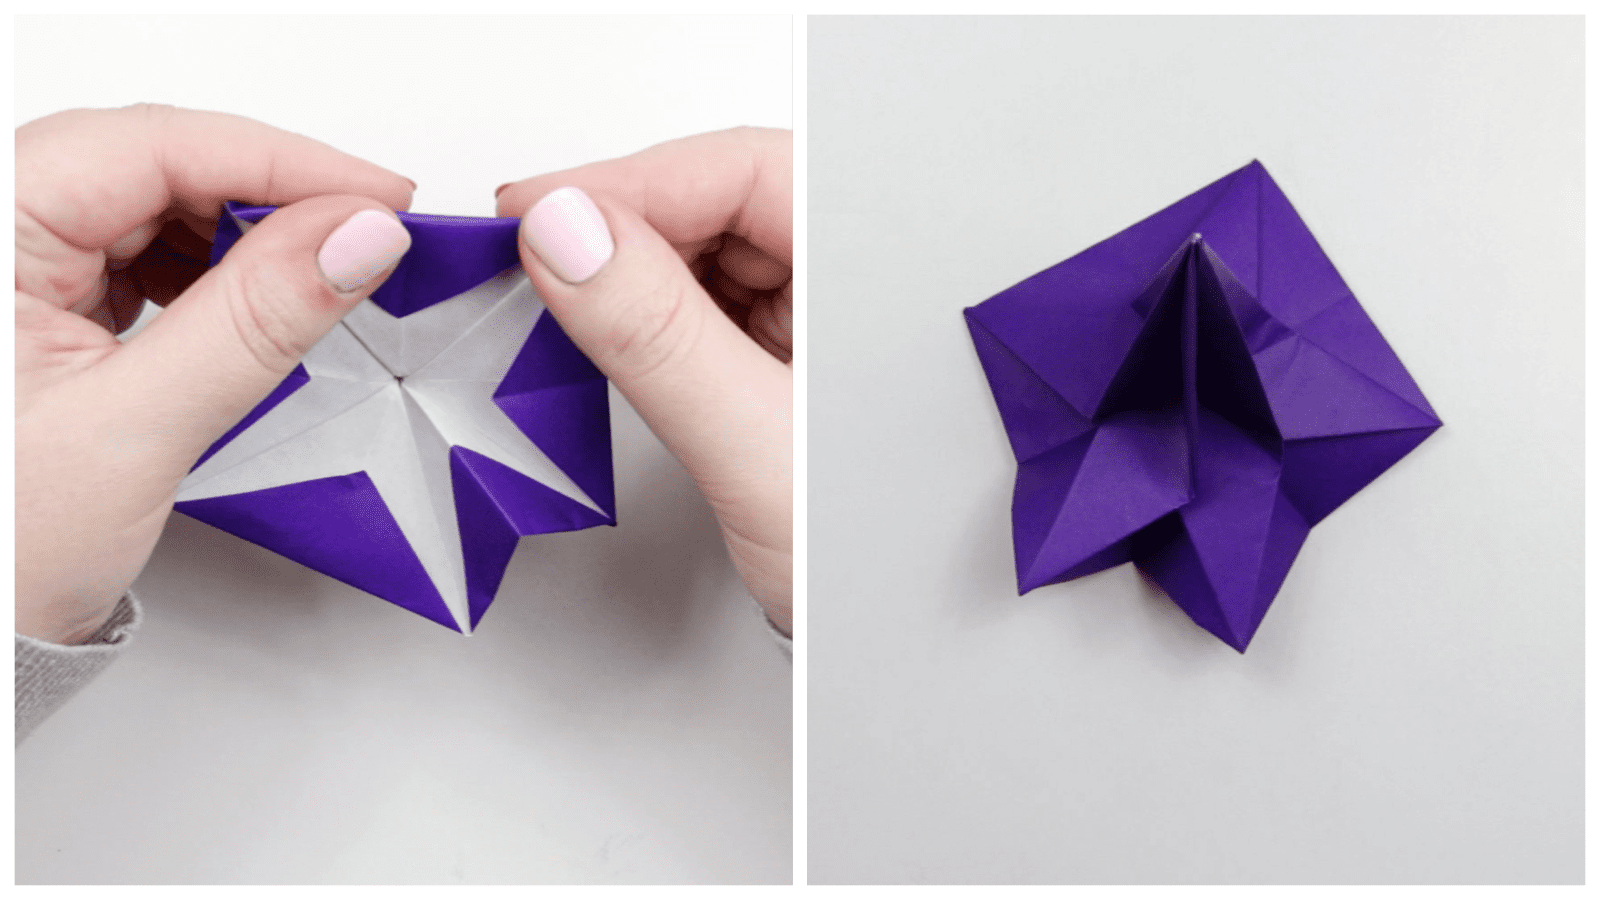 The last steps of folding